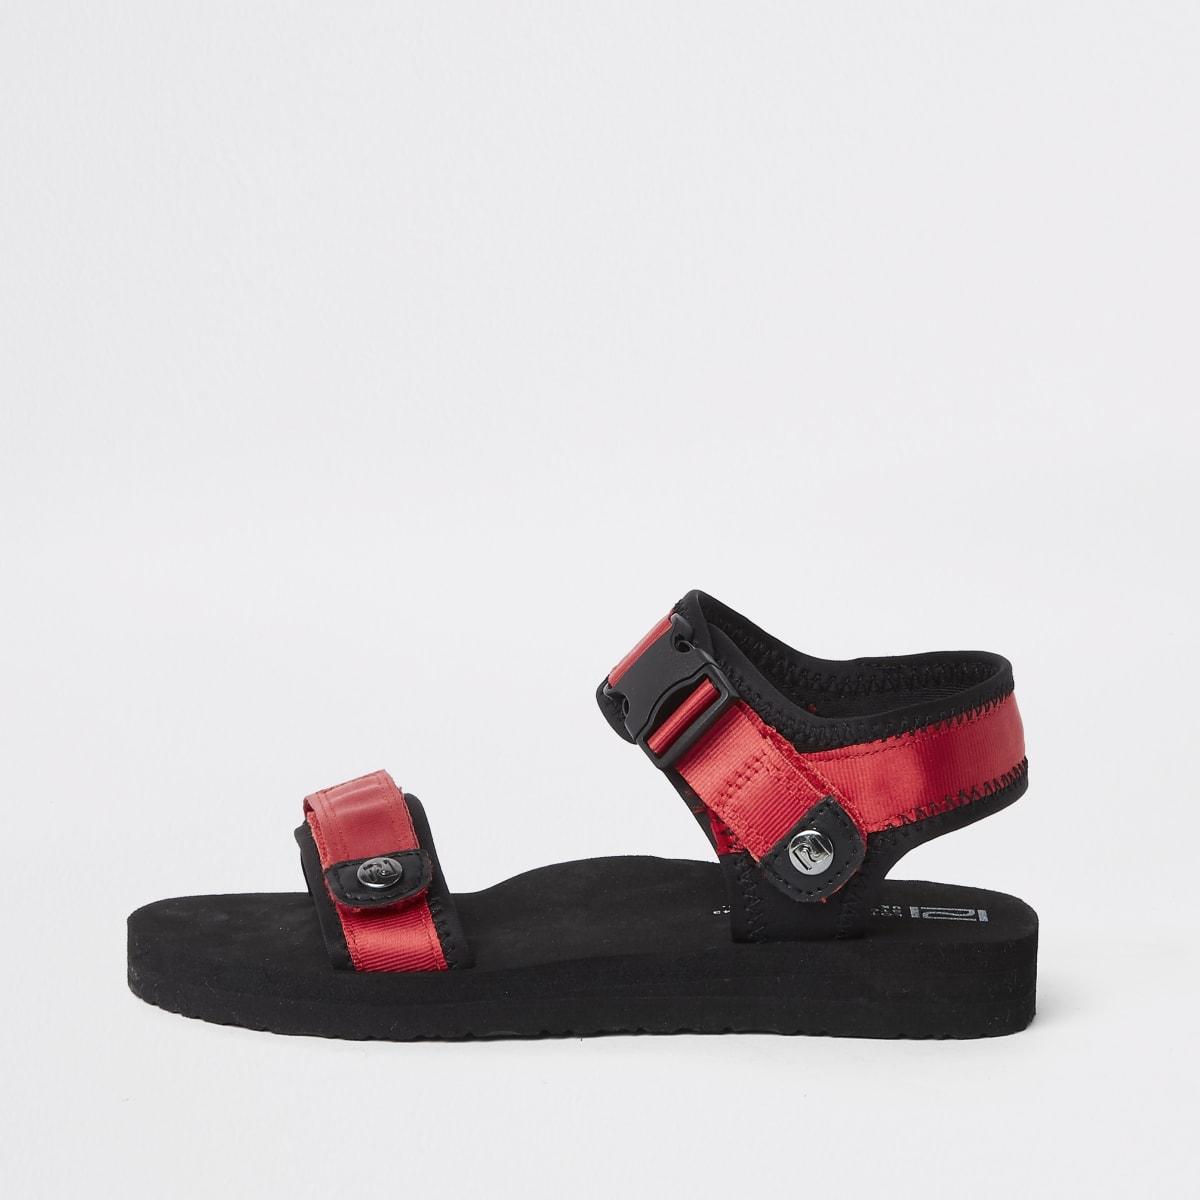 Boys red Velcro sandals